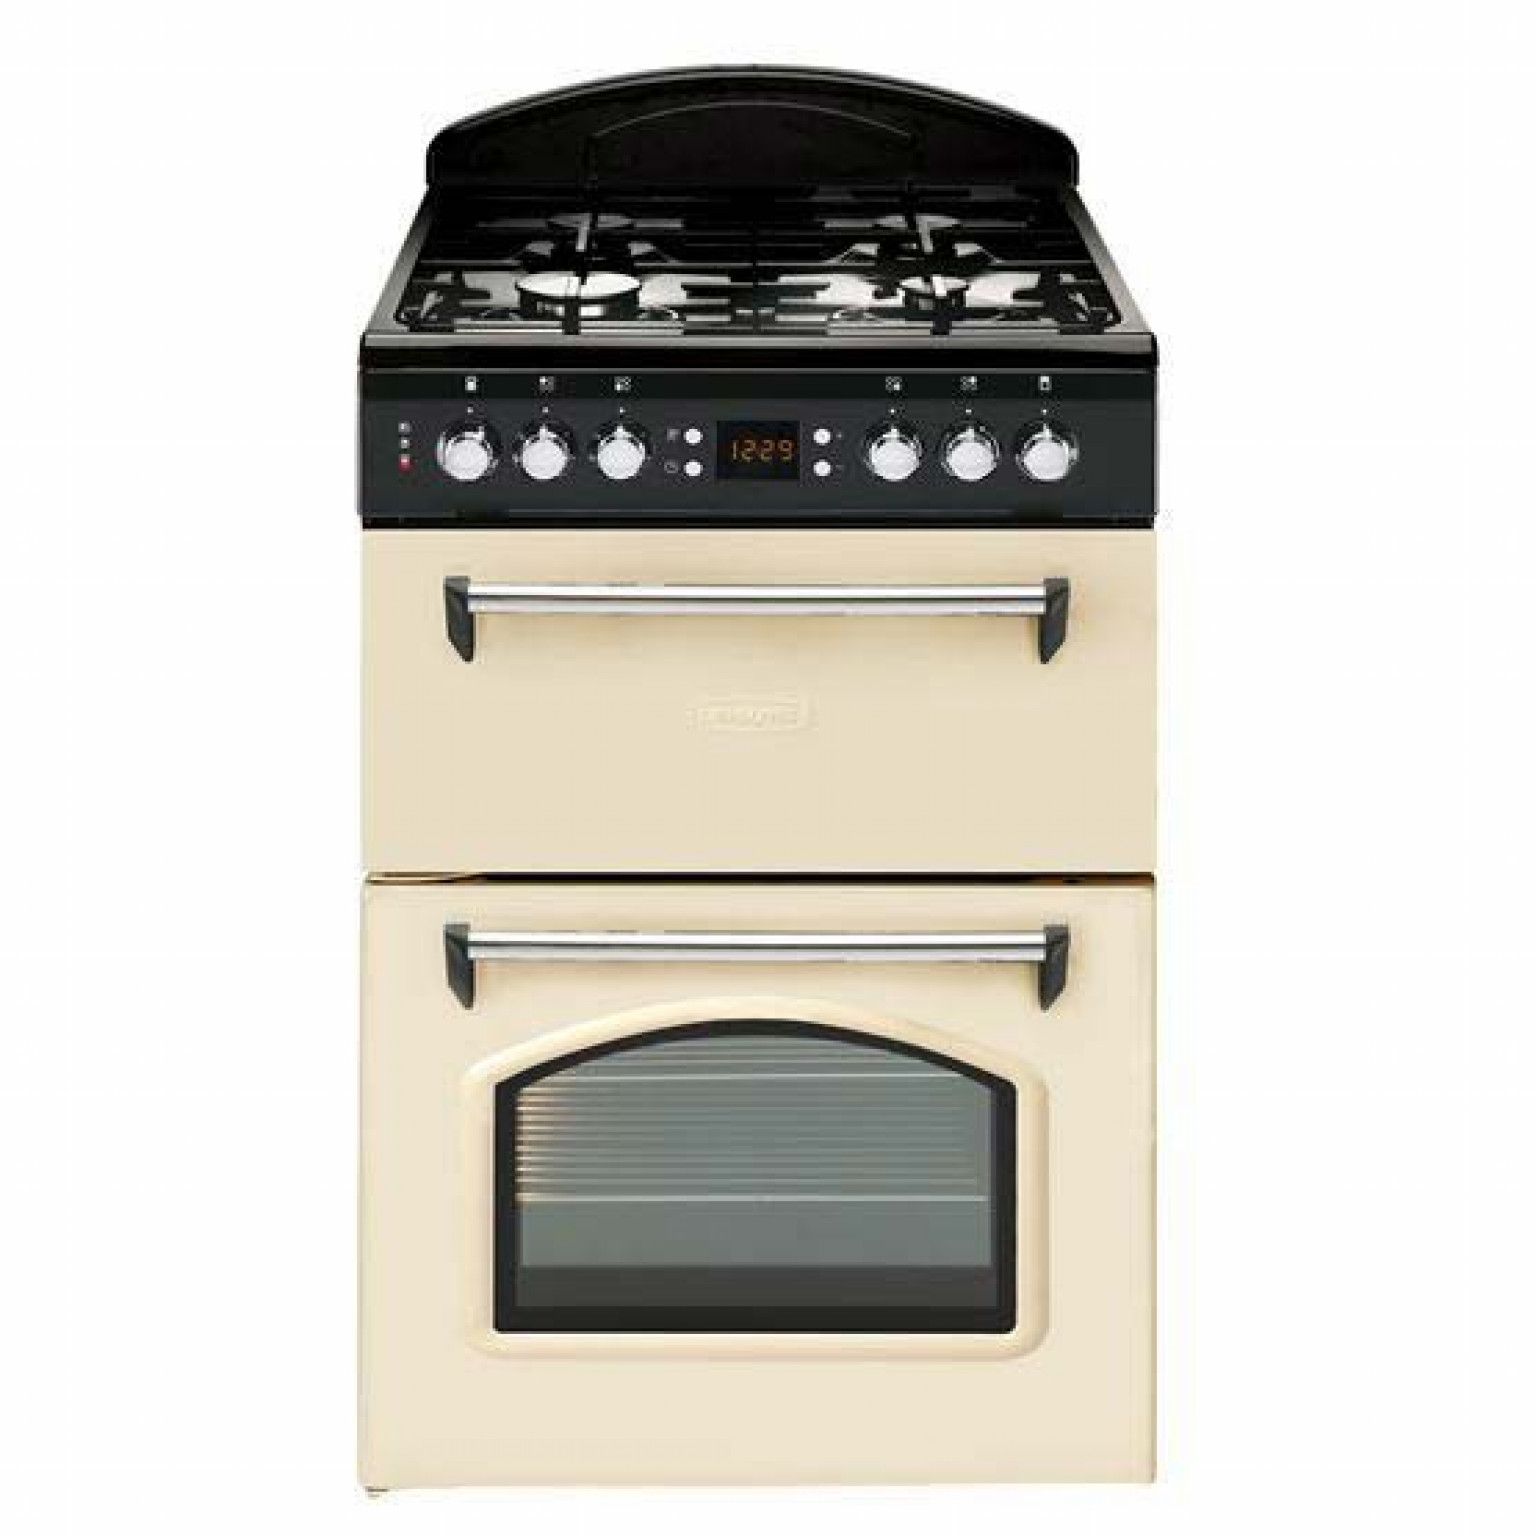 Leisure 60cm Range Cooker | CLA60GAC